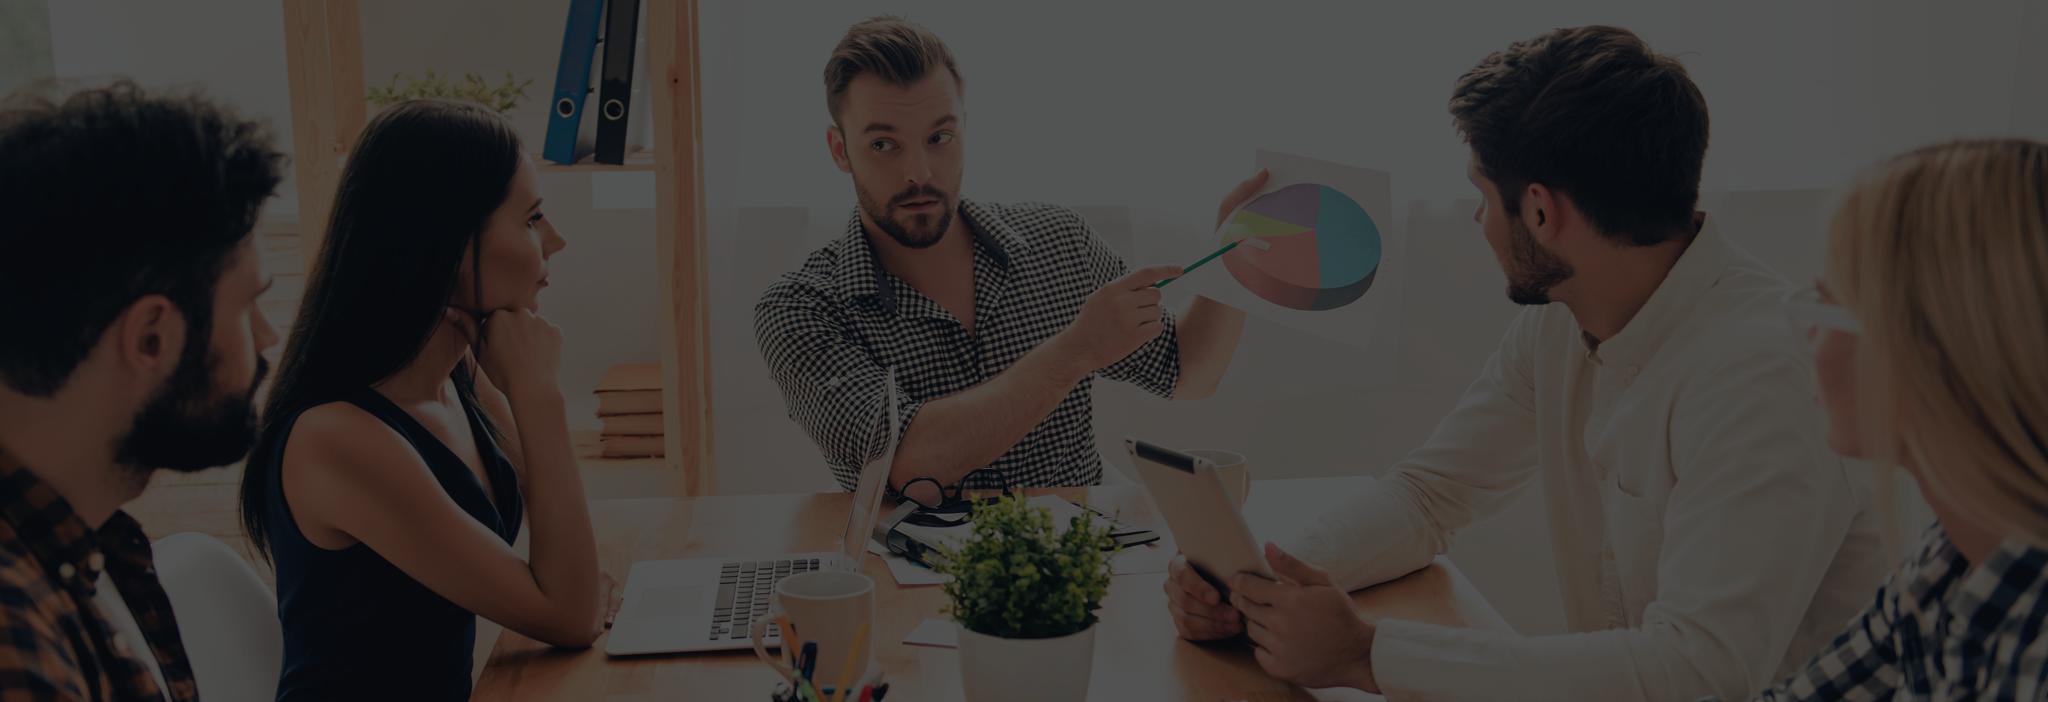 Digital Marketing Strategies Every Company Needs Today